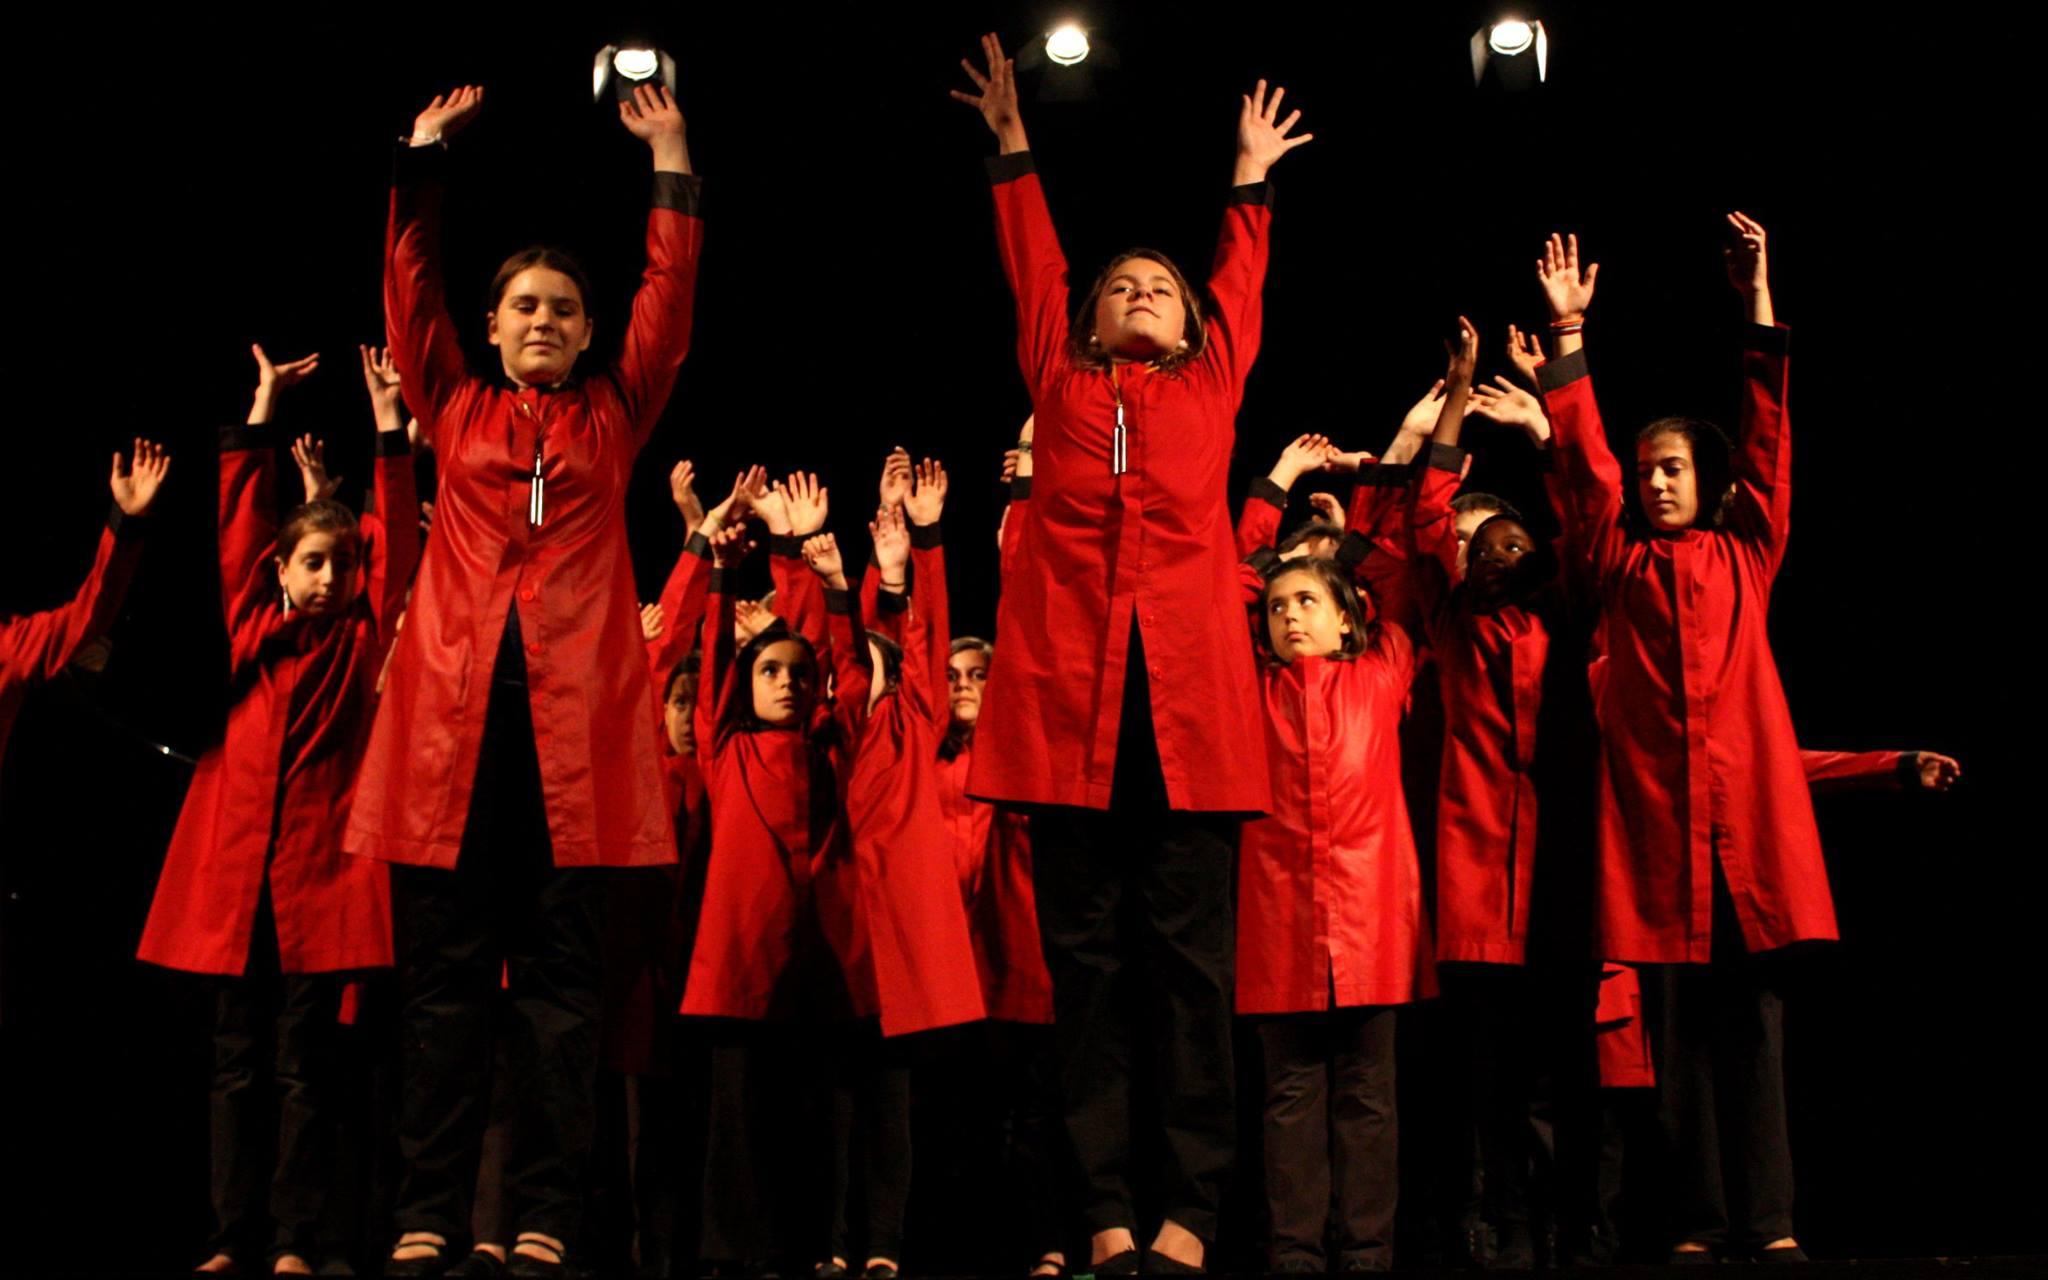 Auditório Municipal recebe Coro Infanto-juvenil da Universidade de Lisboa